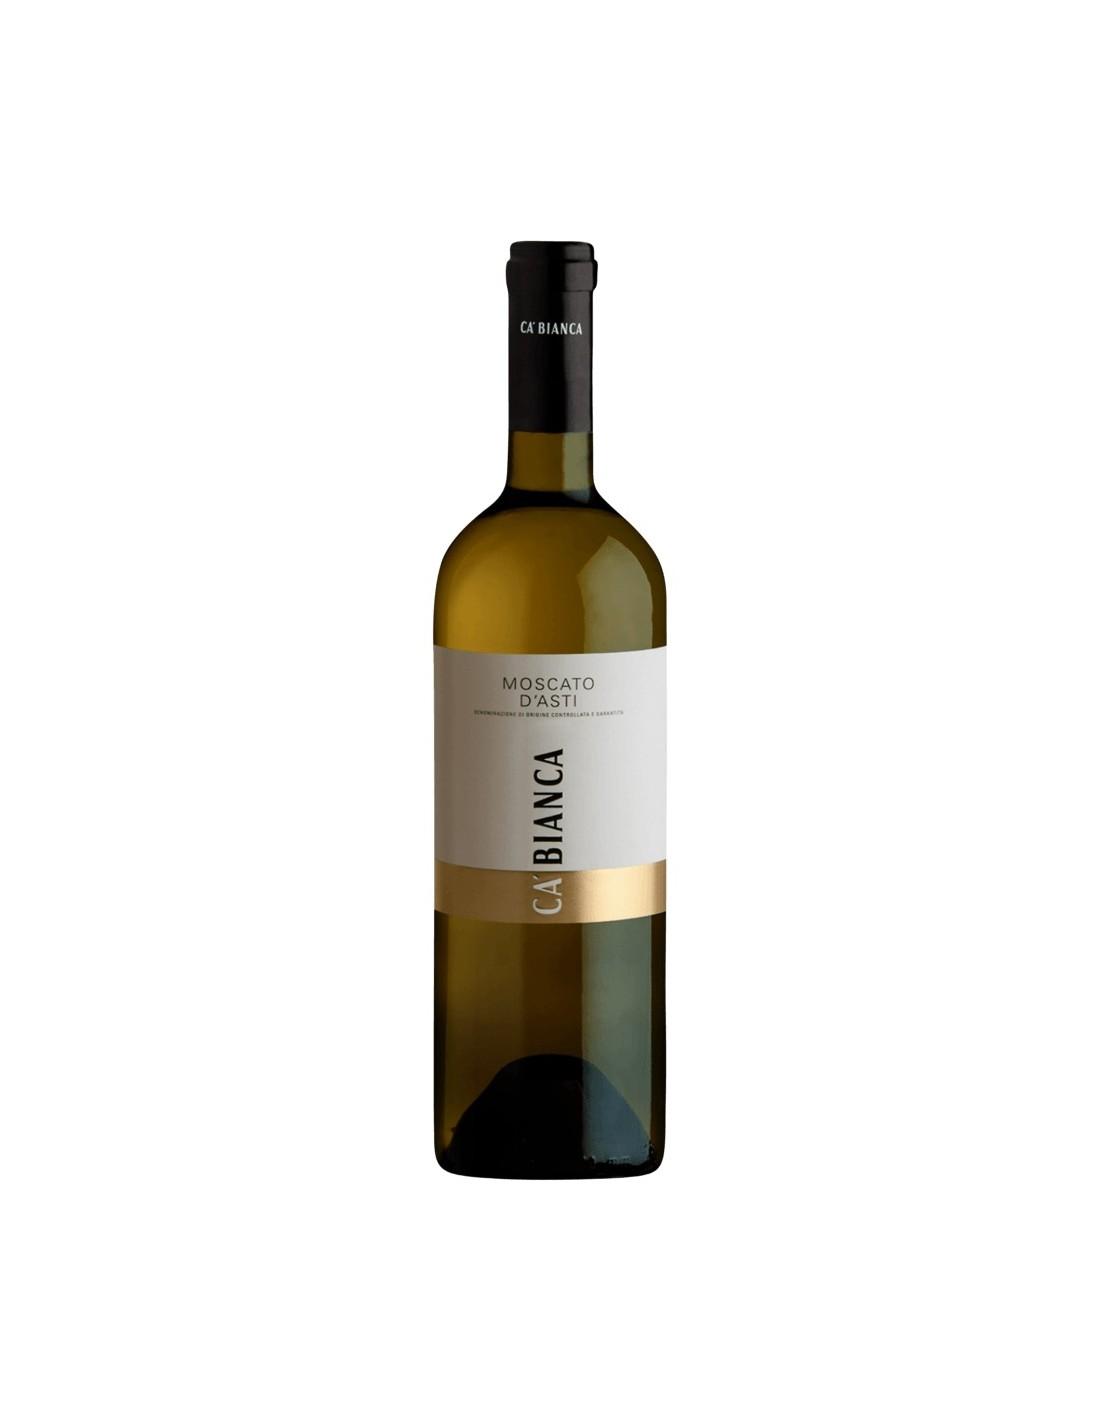 Vin alb, Moscato, Tenimenti Ca Bianca d'Asti, 0.75L, 5% alc., Italia